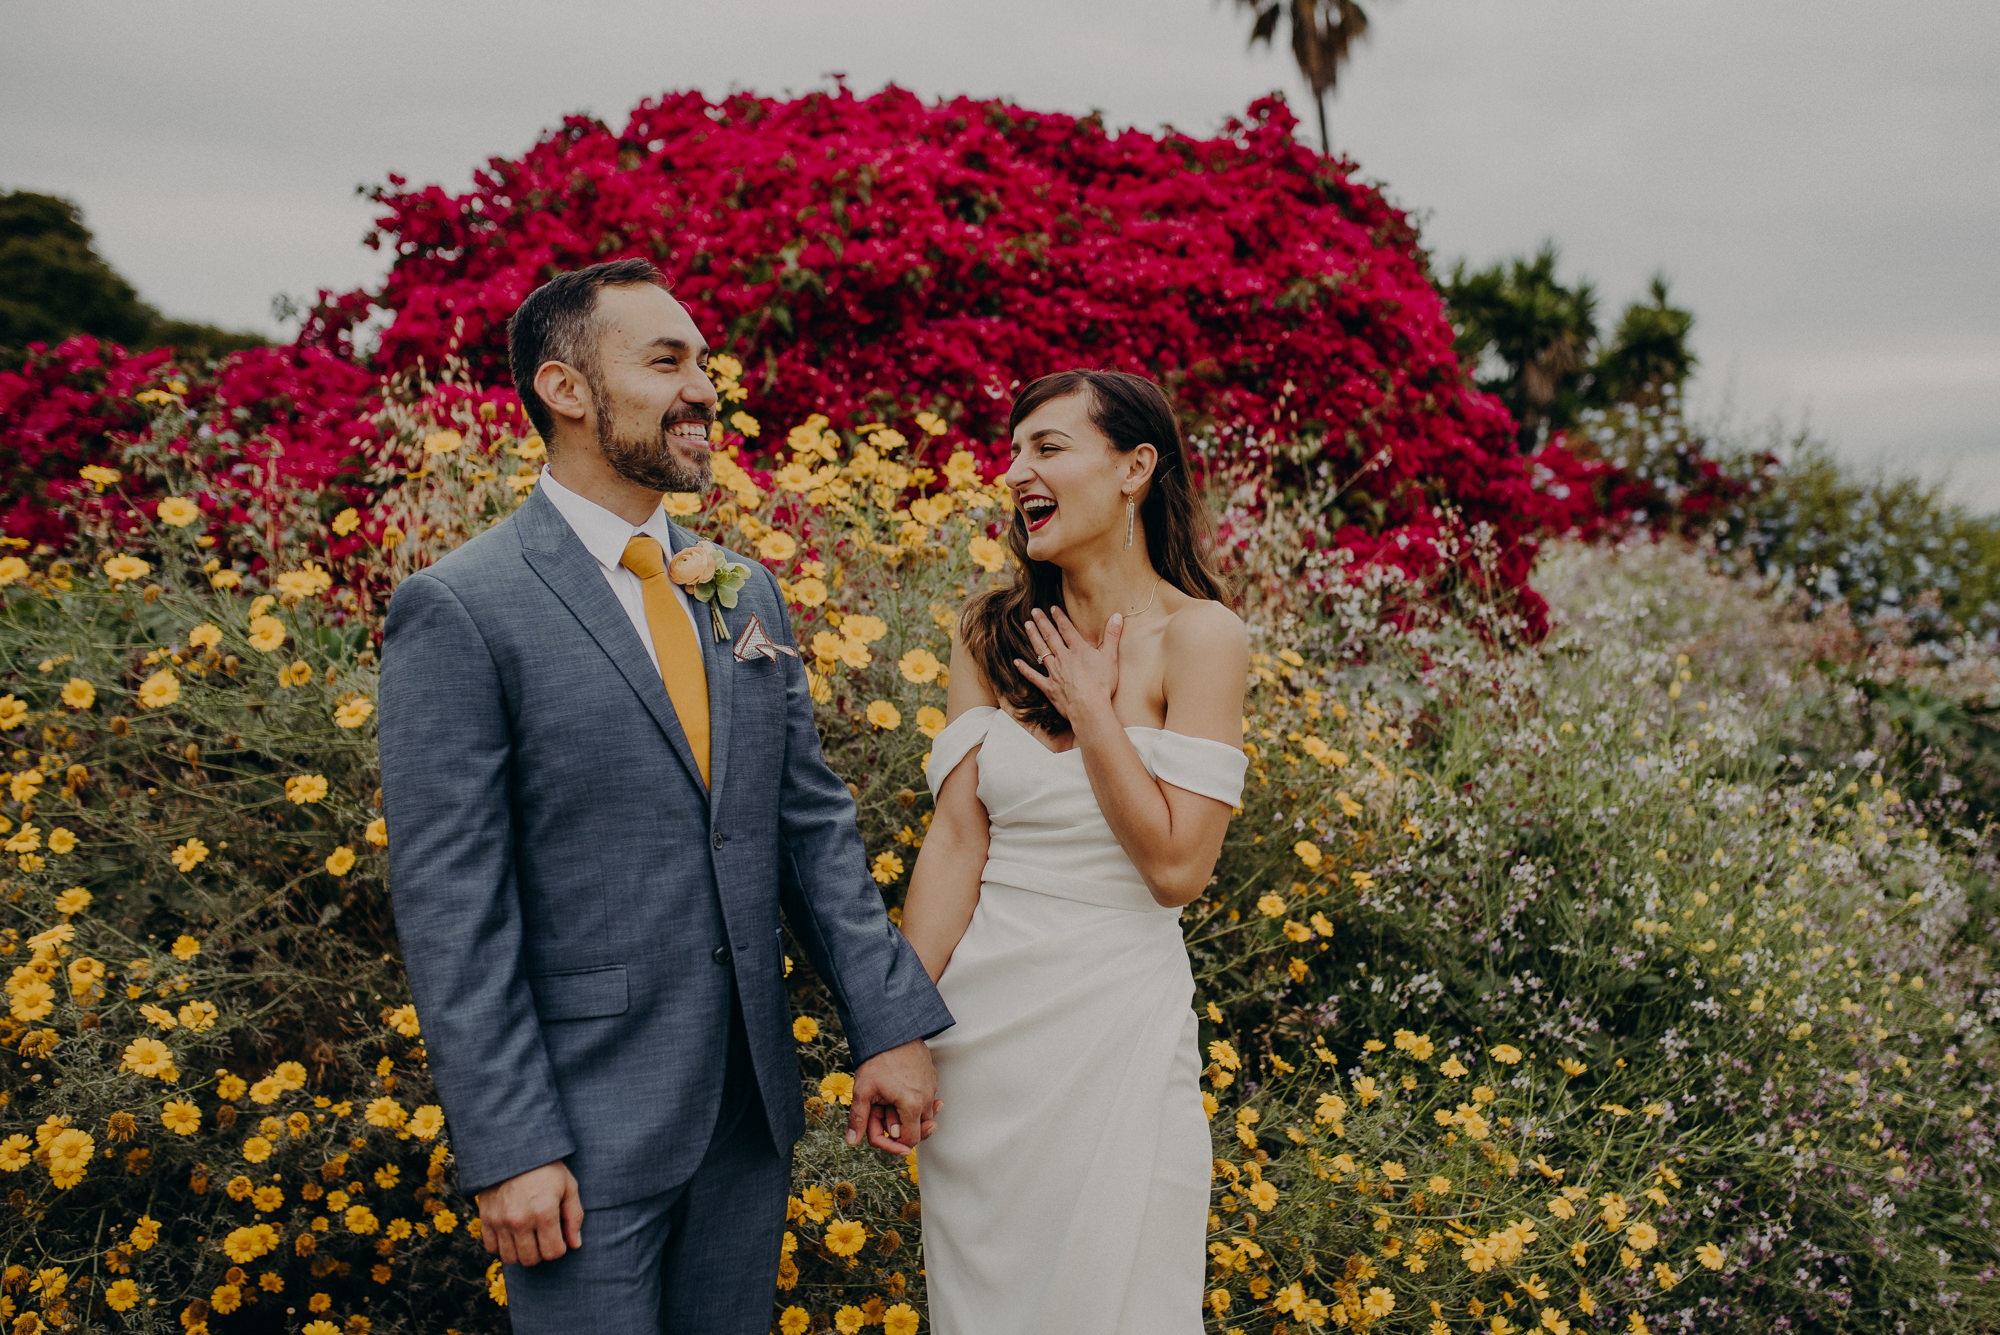 elopement photographer in los angeles - la wedding photographer - isaiahandtaylor.com-029.jpg